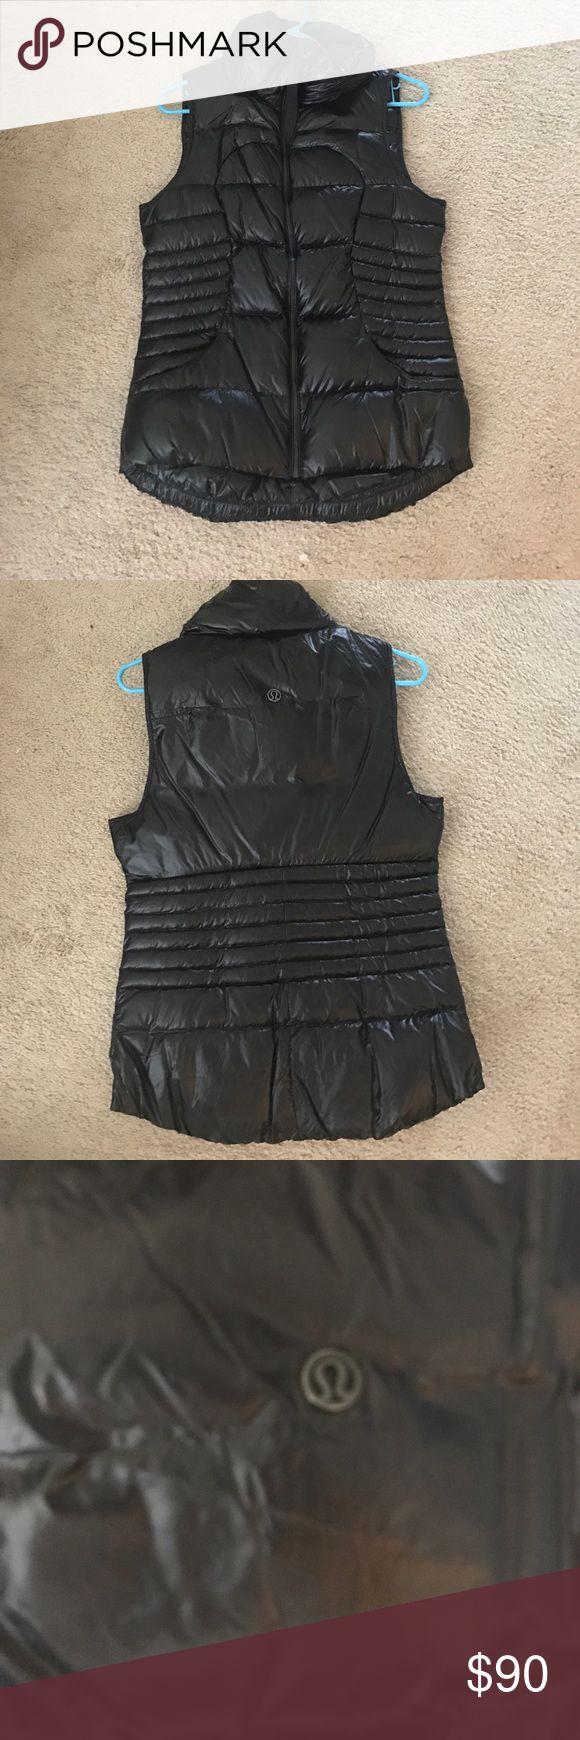 Lululemon vest size 8 Lululemon down vest. Shiny black color. Super lightweight and folds really small, but super warm! Worn once. lululemon athletica Jackets & Coats Vests